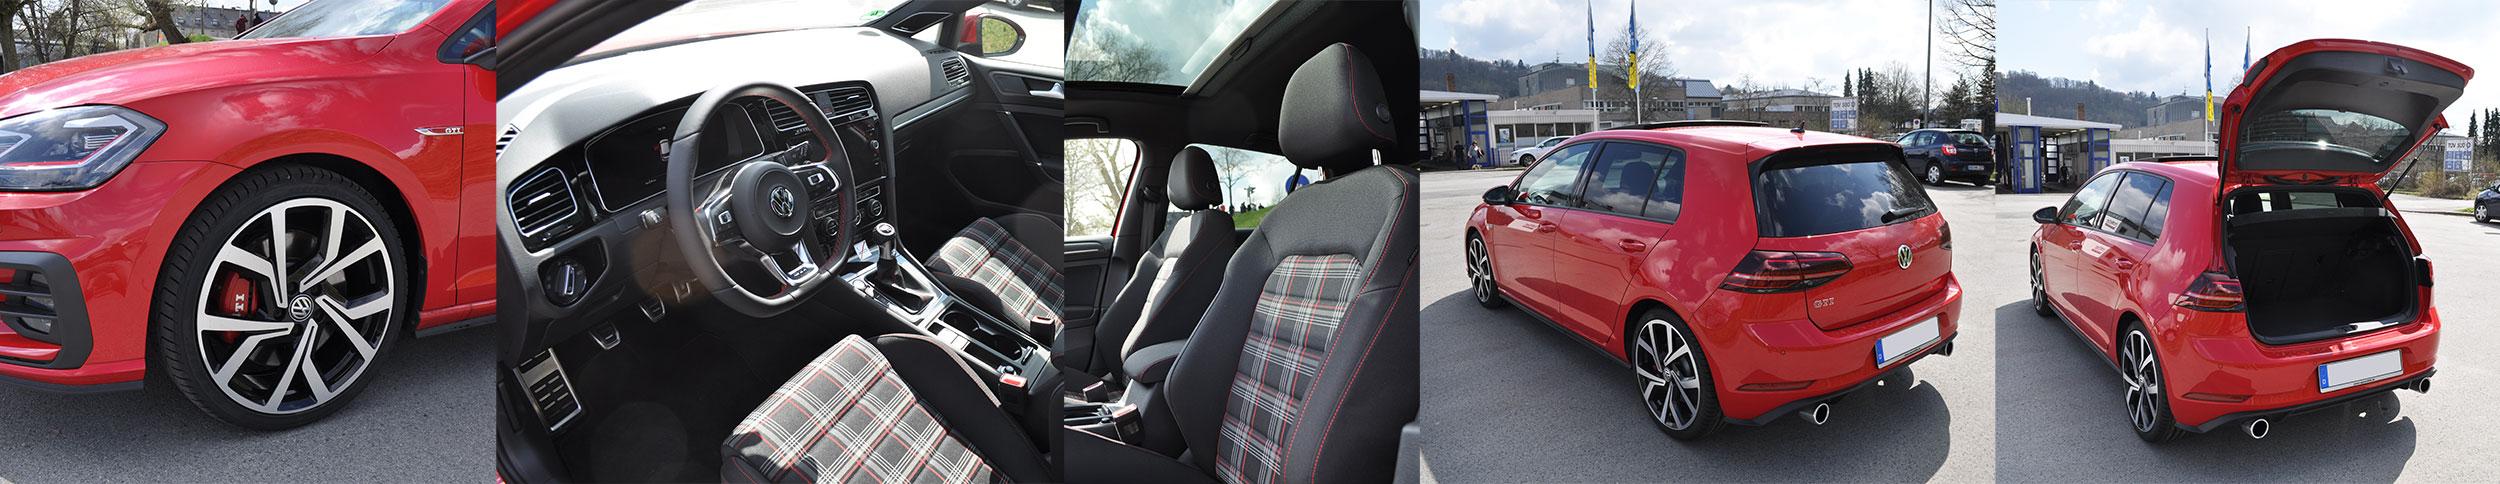 VW Golf GTI 2018 - Ausstattung